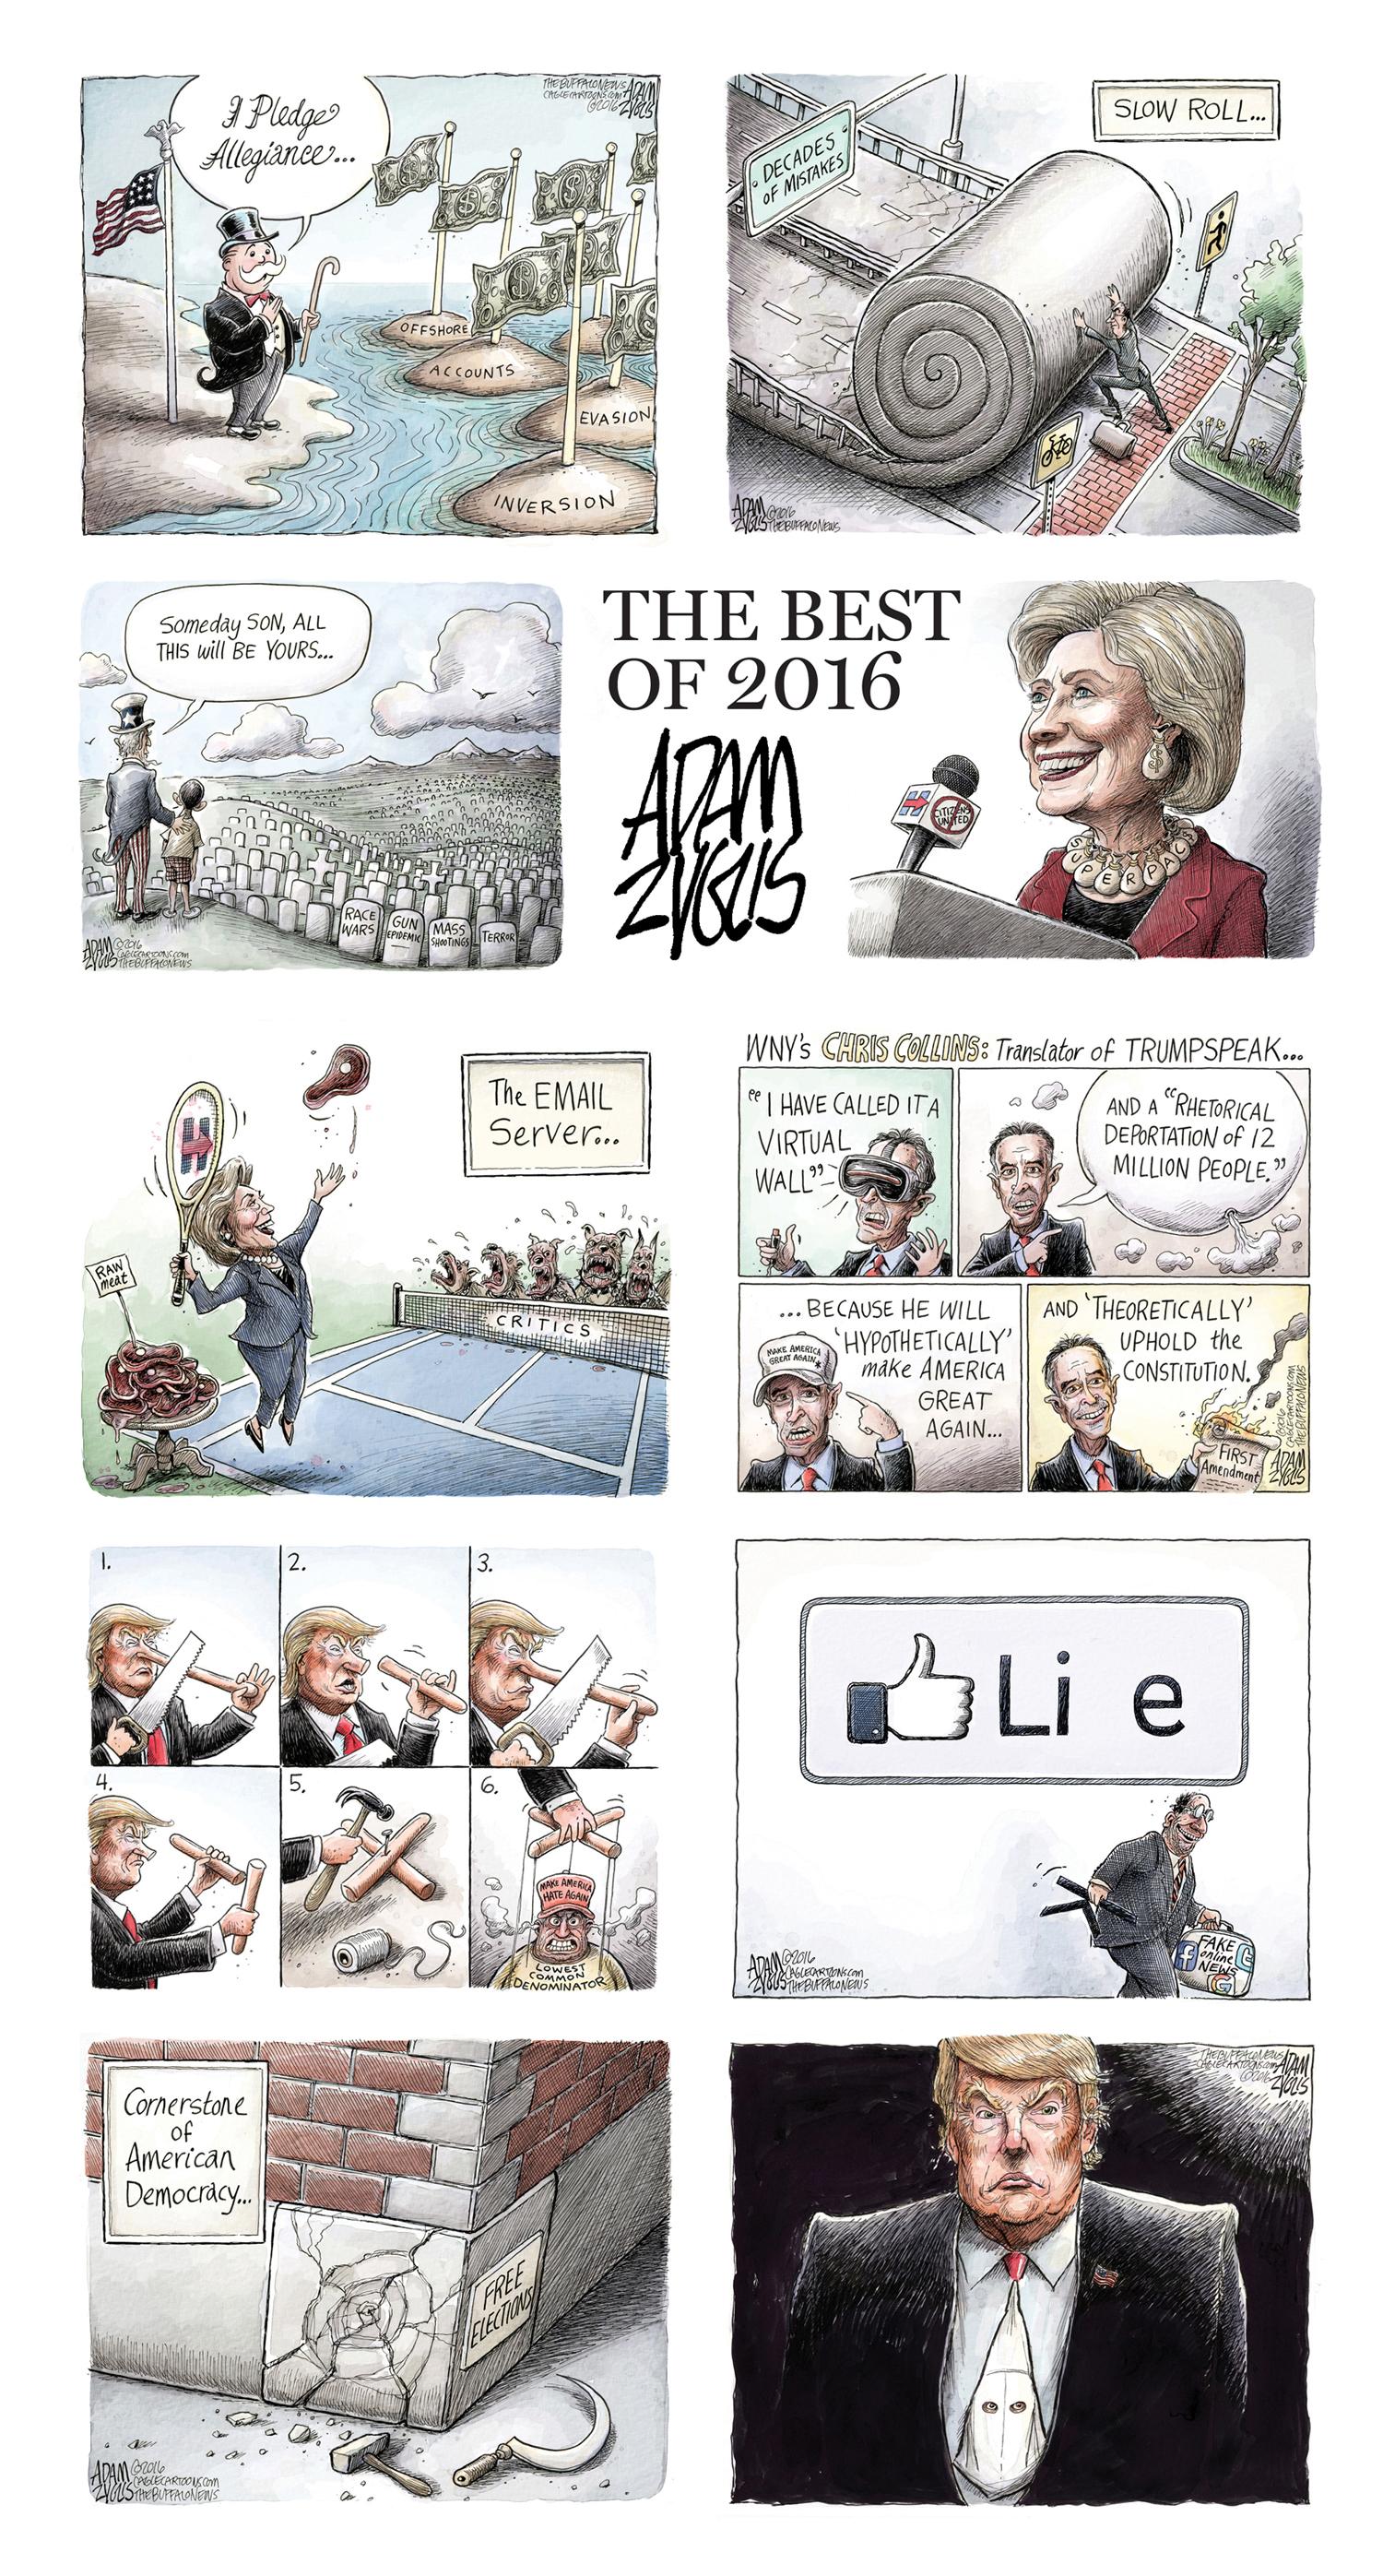 2016, zyglis, trump, hillary, clinton, guns, shootings, chris collins, Facebook, fake news,